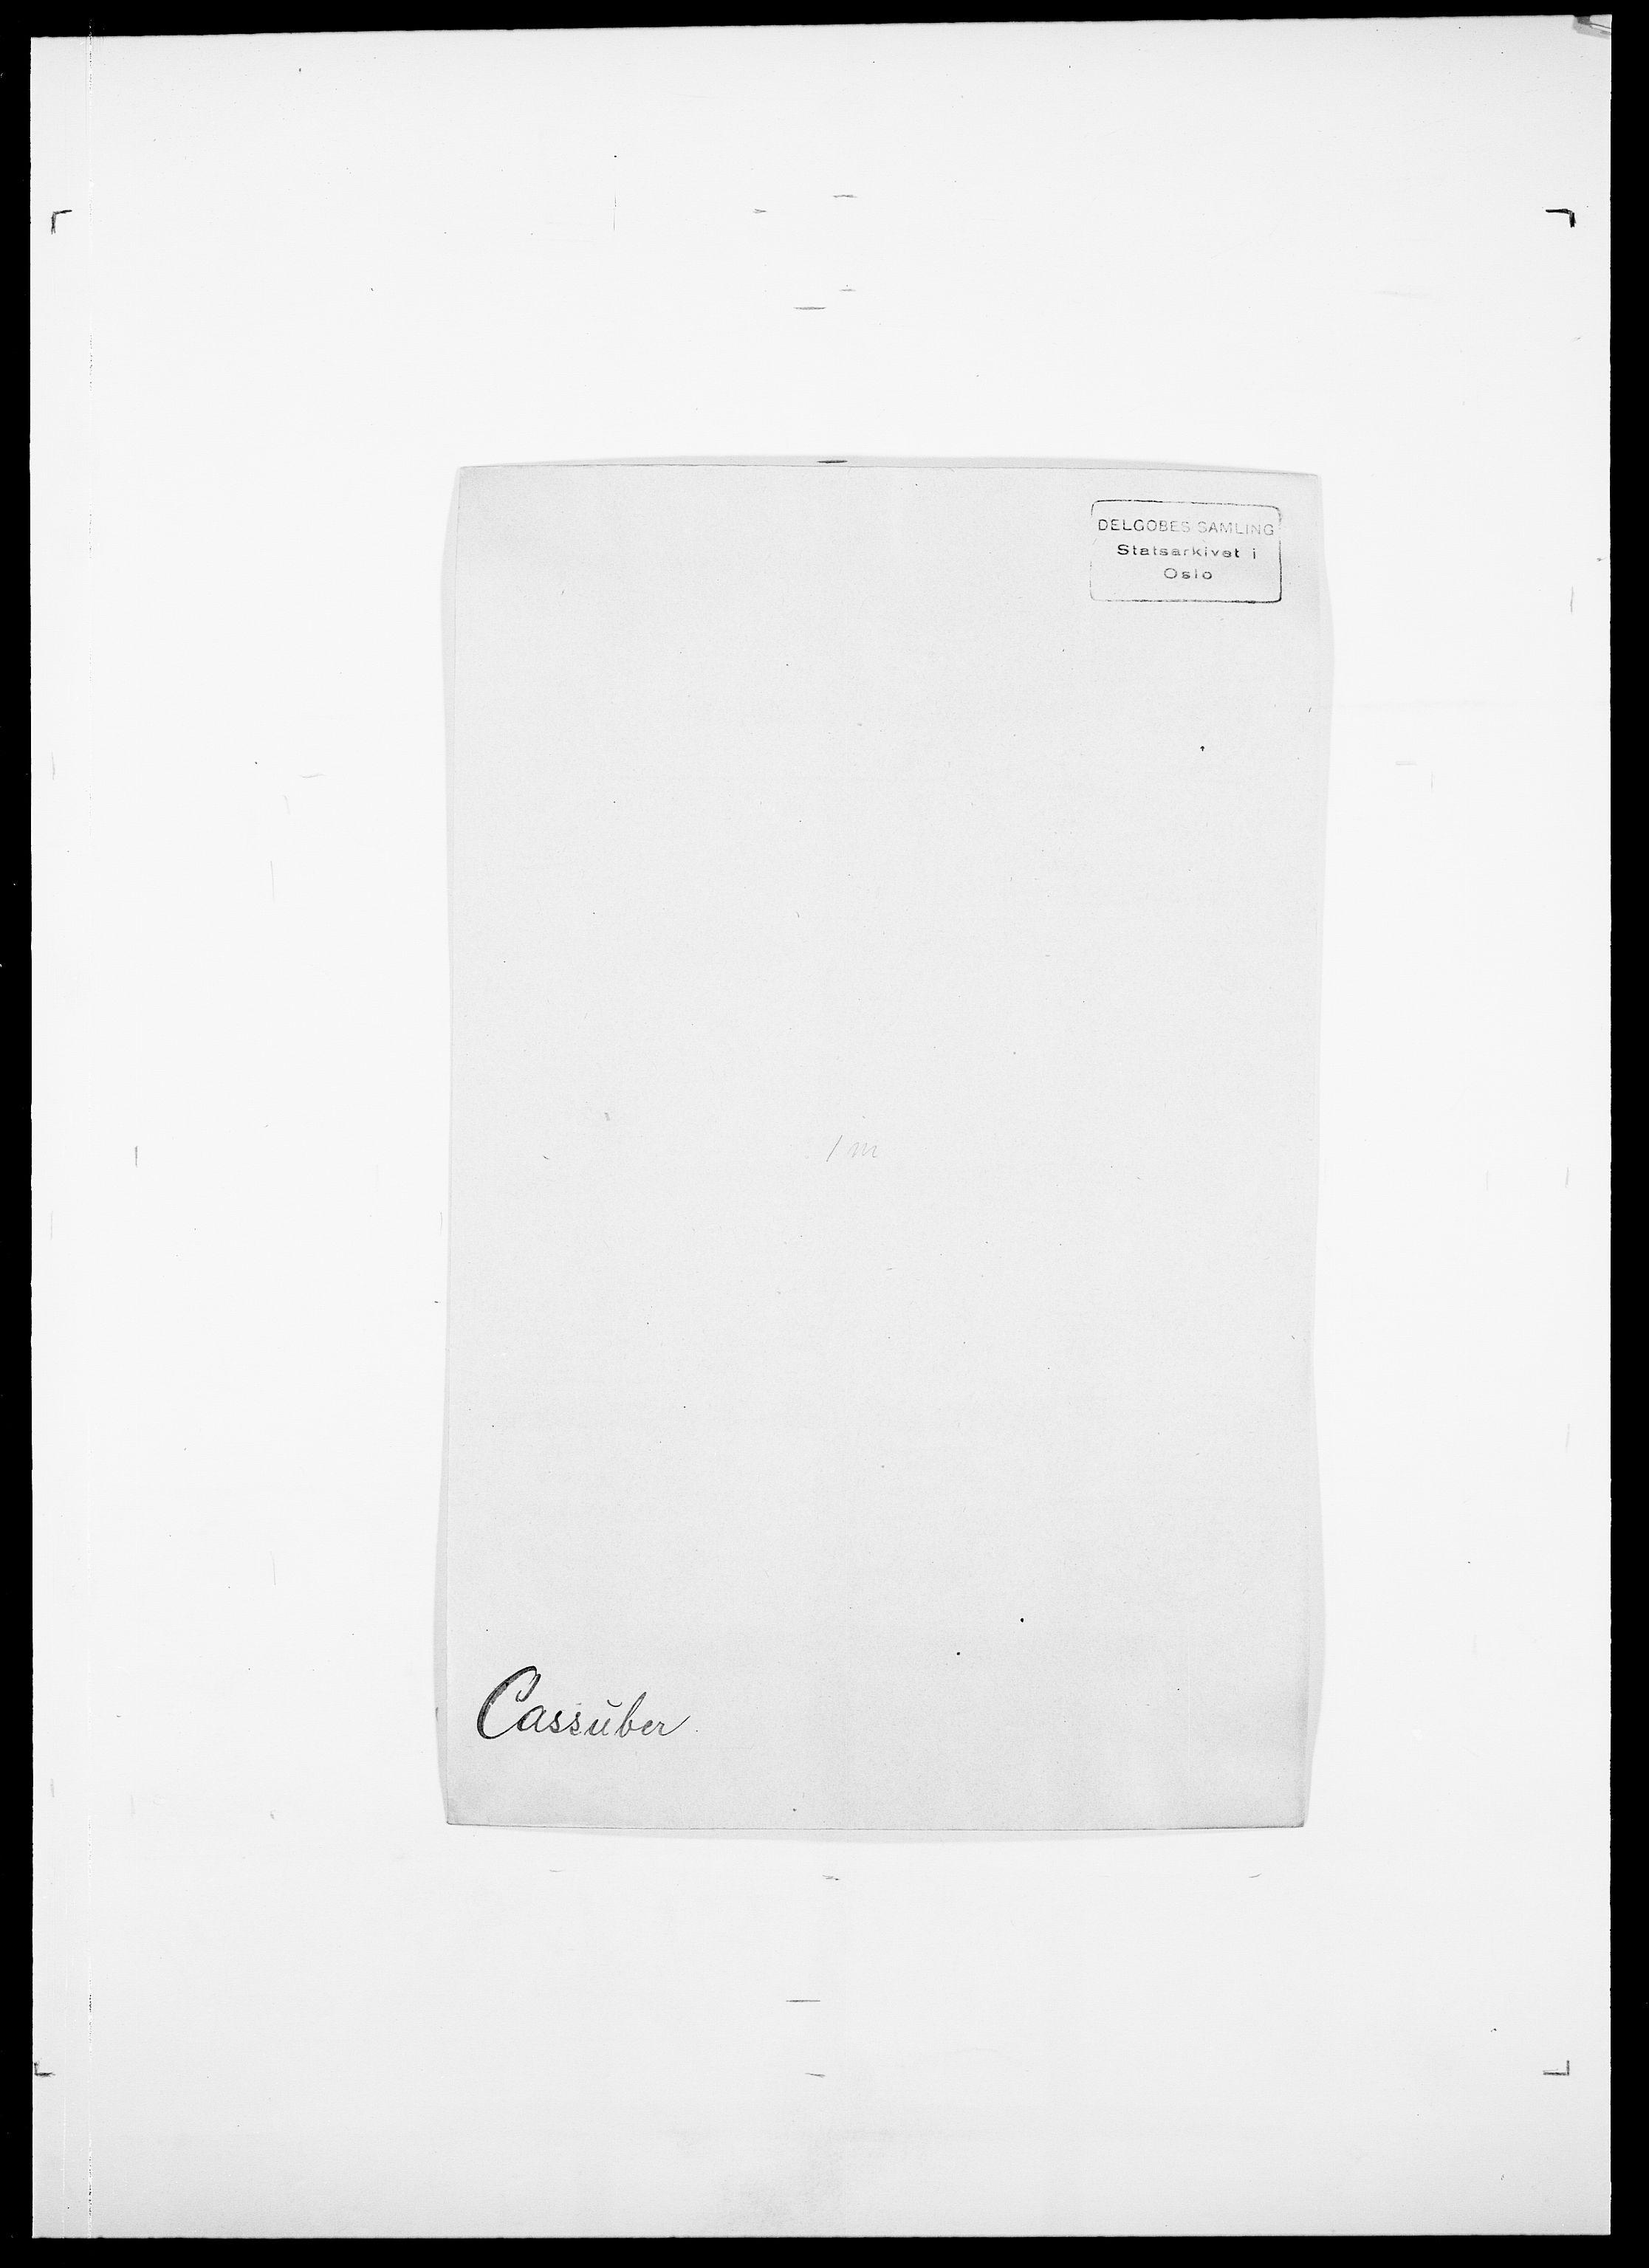 SAO, Delgobe, Charles Antoine - samling, D/Da/L0008: Capjon - Dagenbolt, s. 129